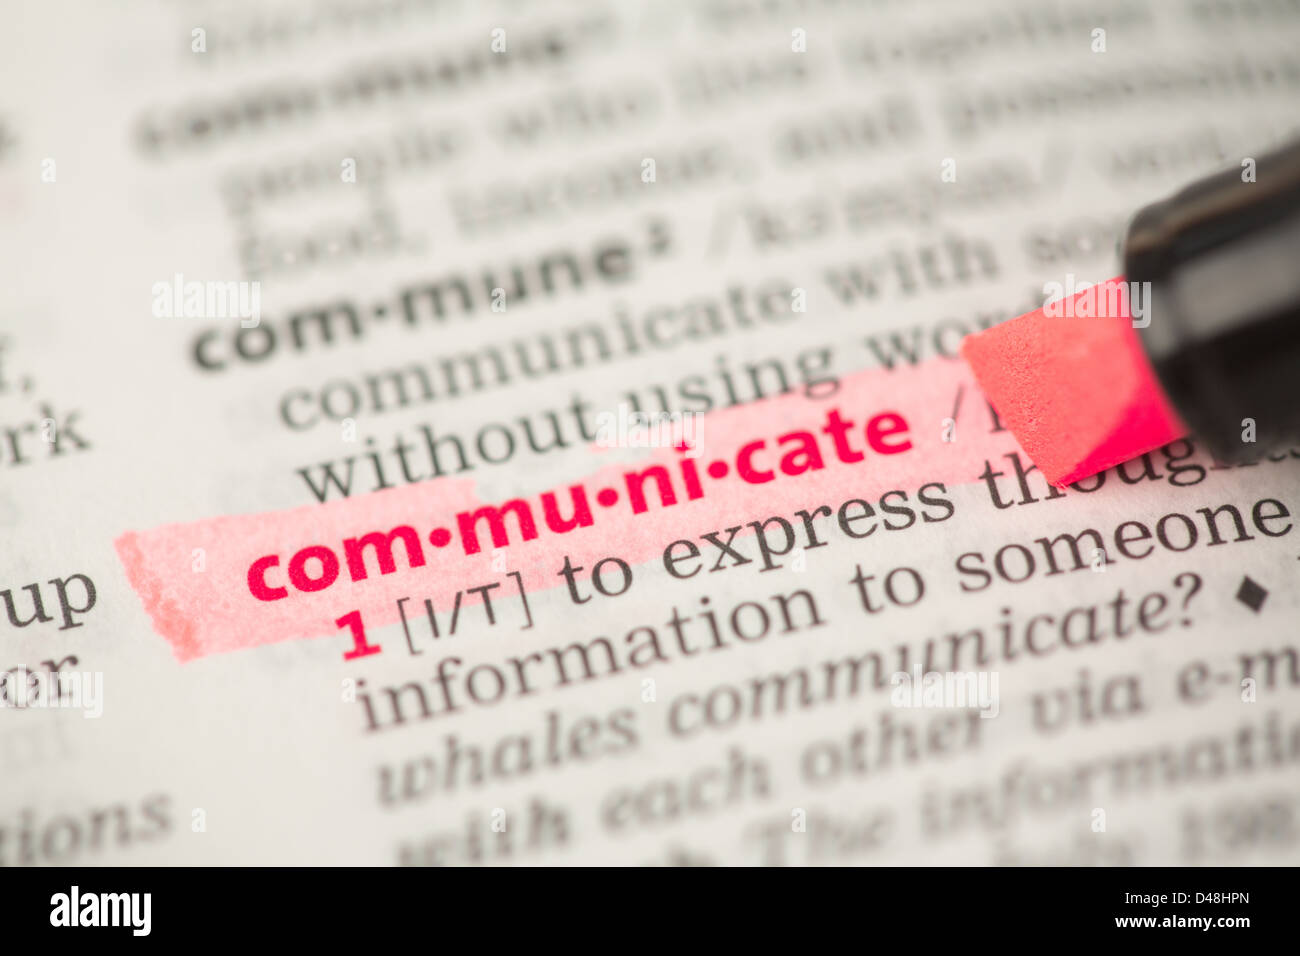 Comunicarse definición resaltada en rojo Imagen De Stock